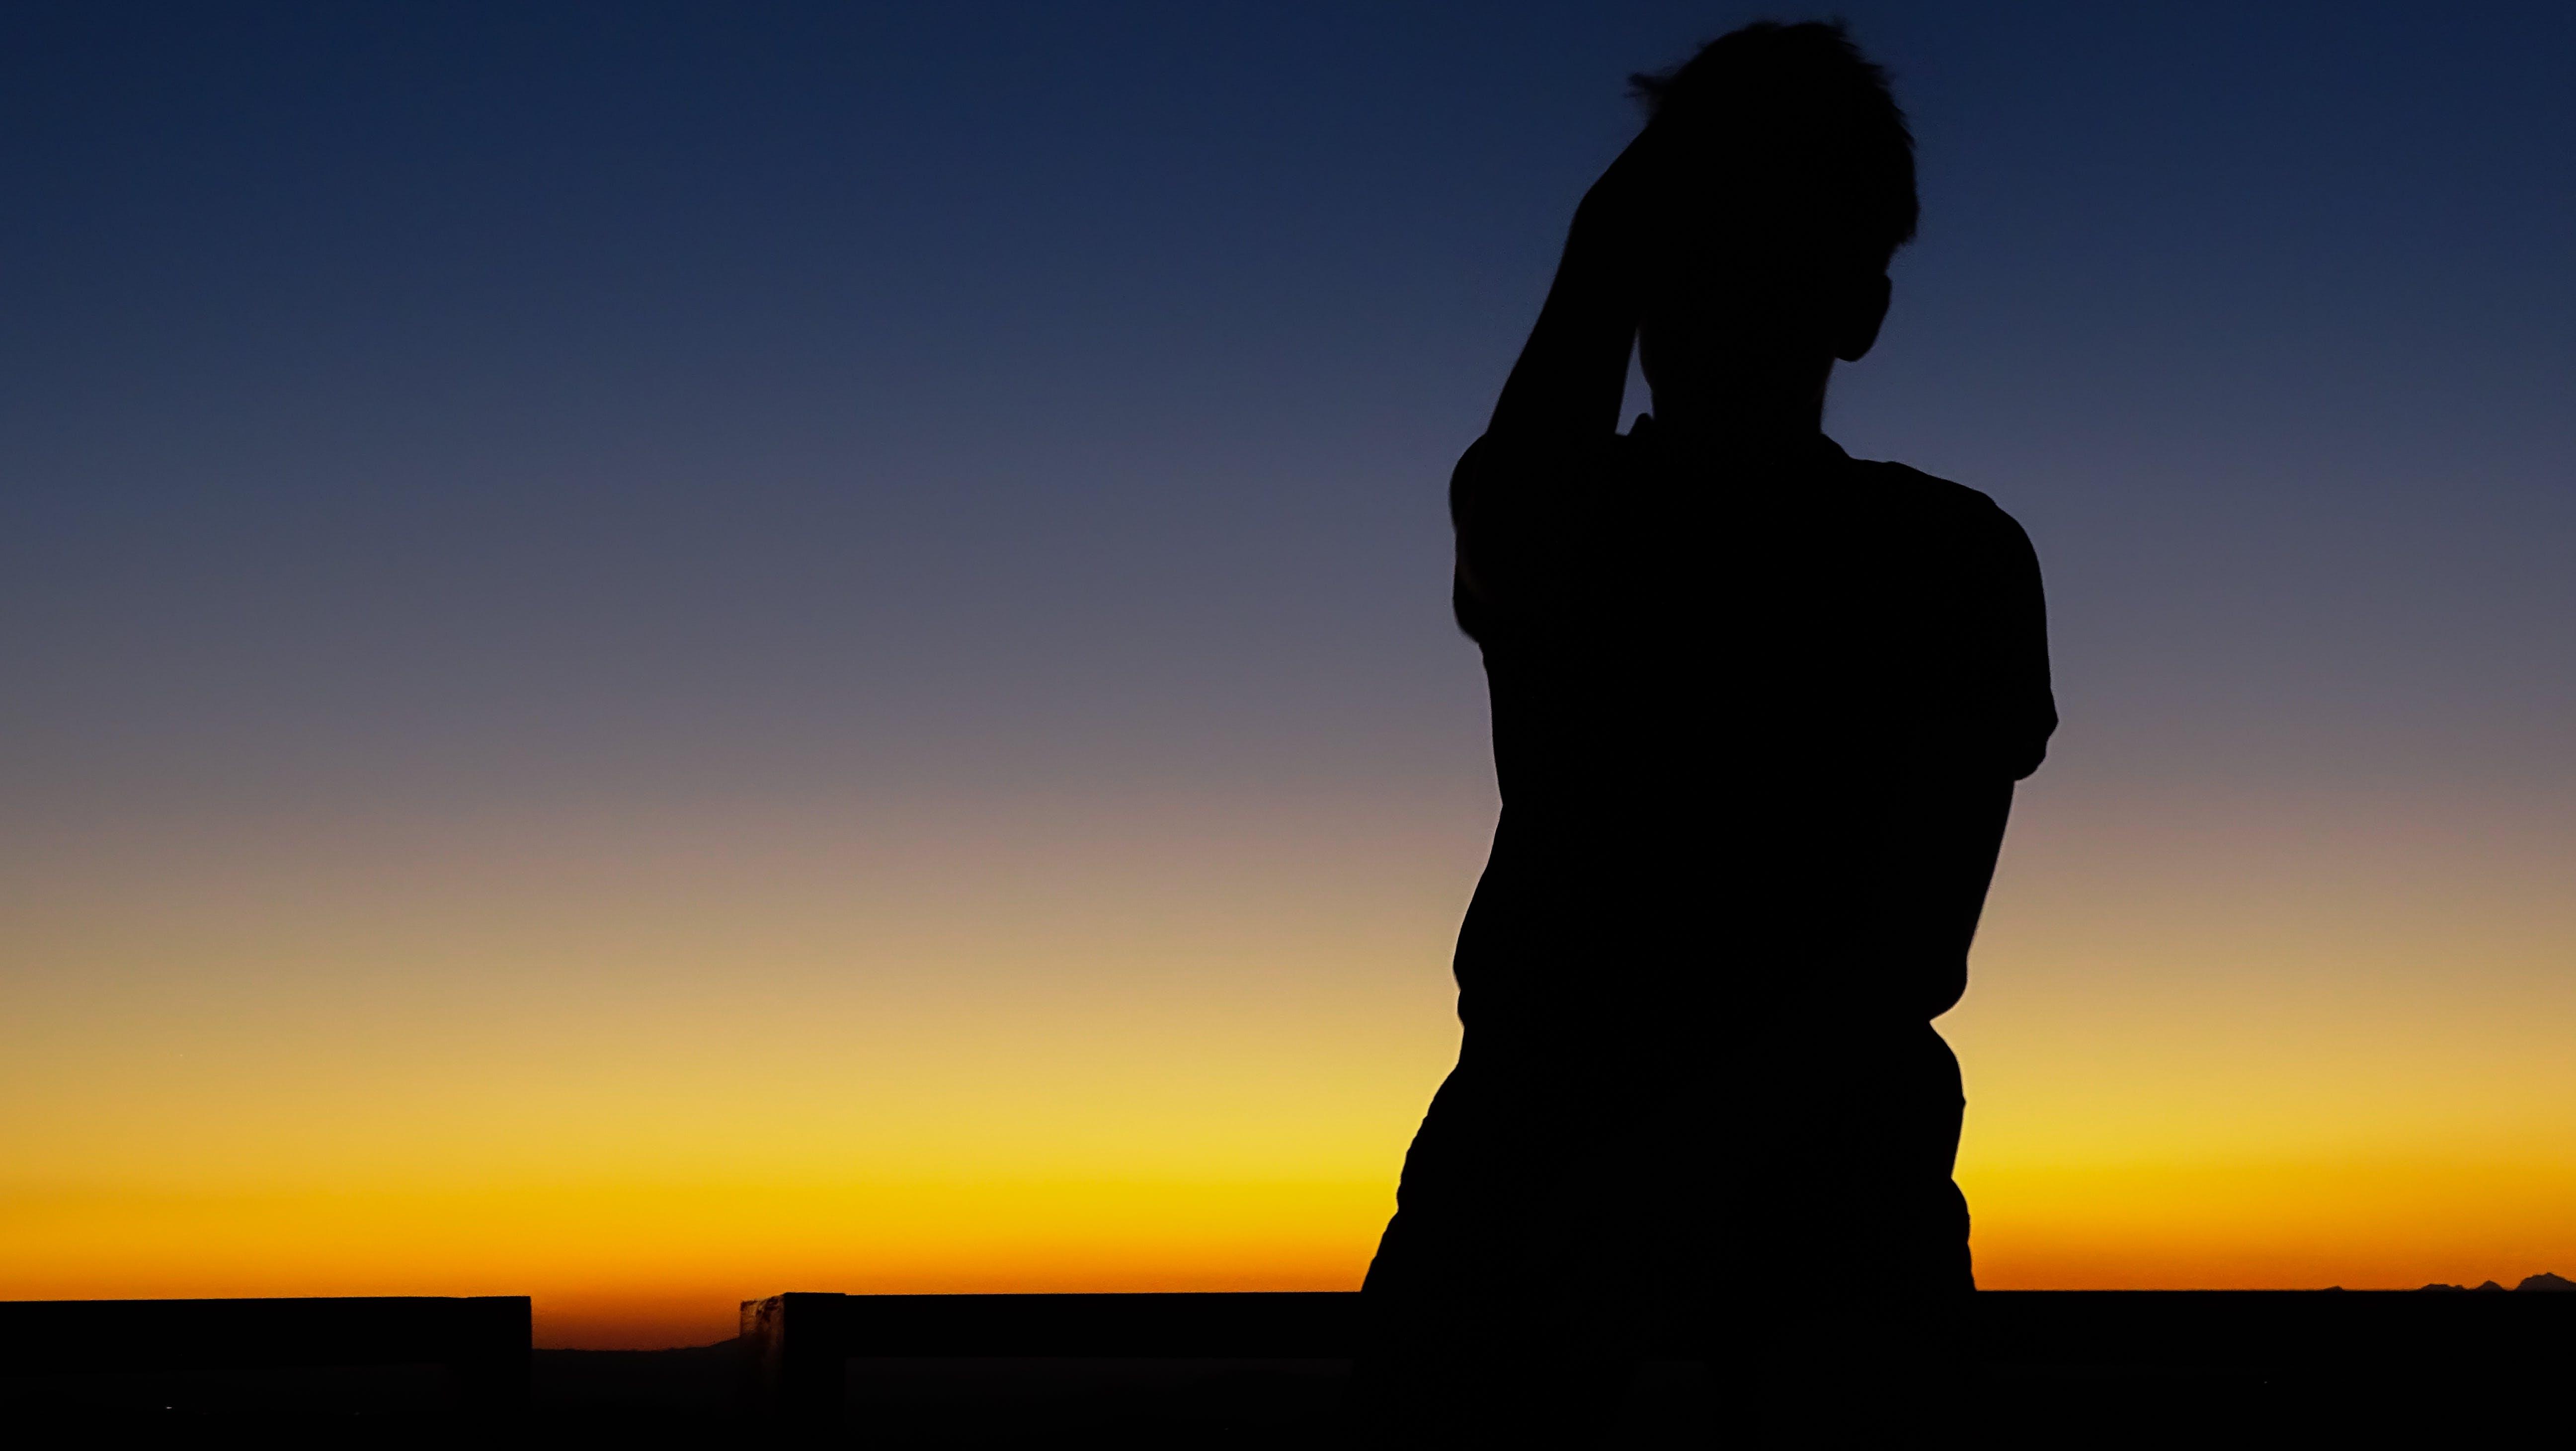 Silhouette Photo of Person